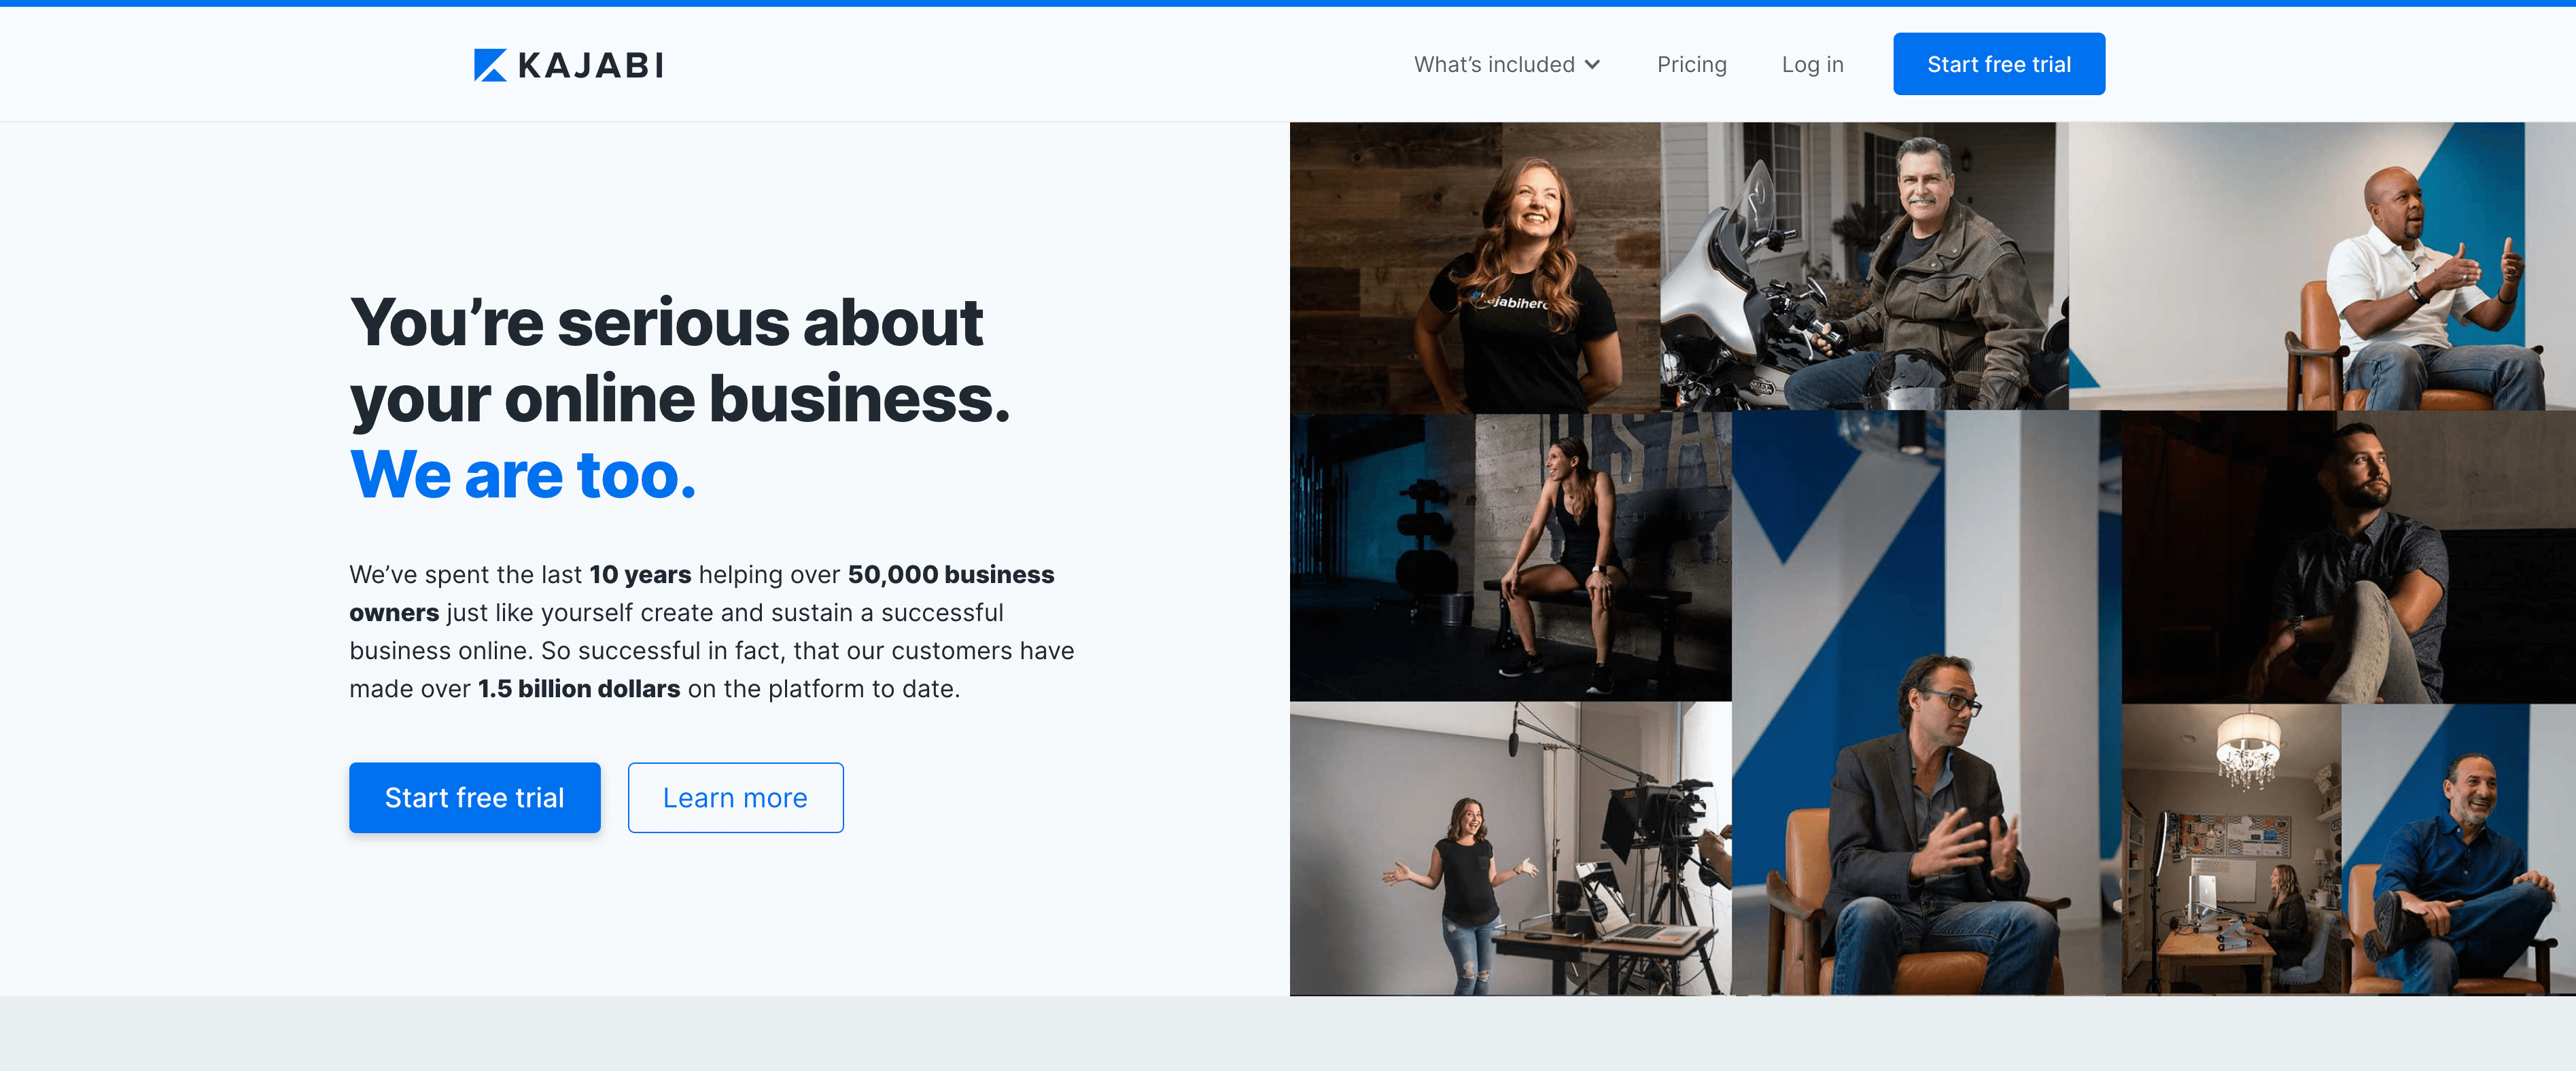 herramienta de email marketing